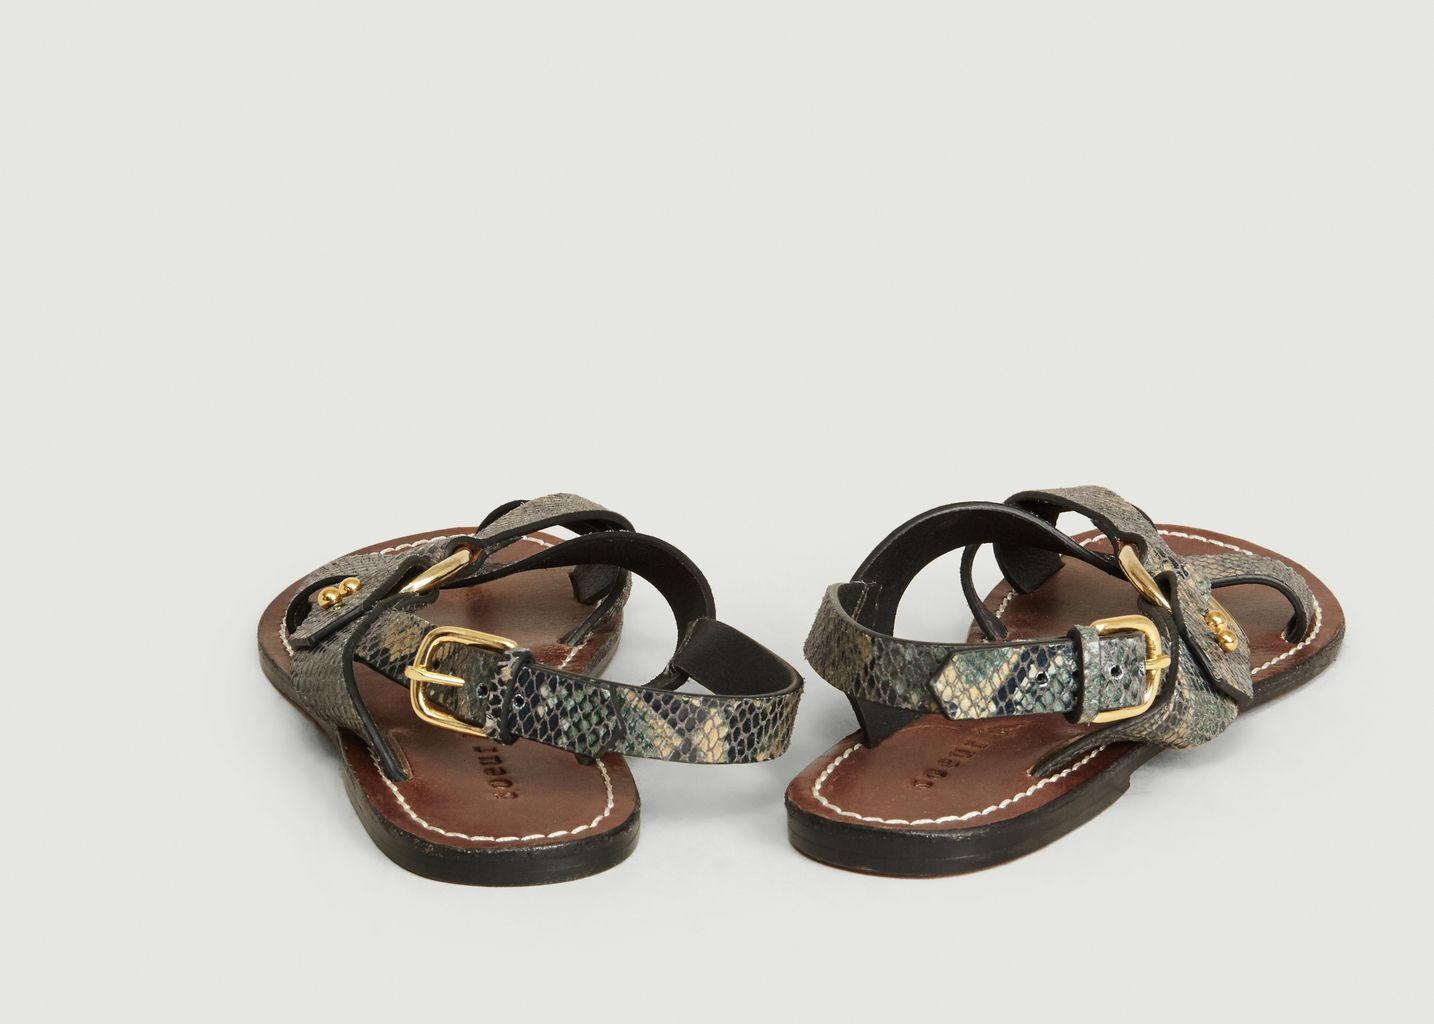 Sandales Florence Effet Python - Soeur